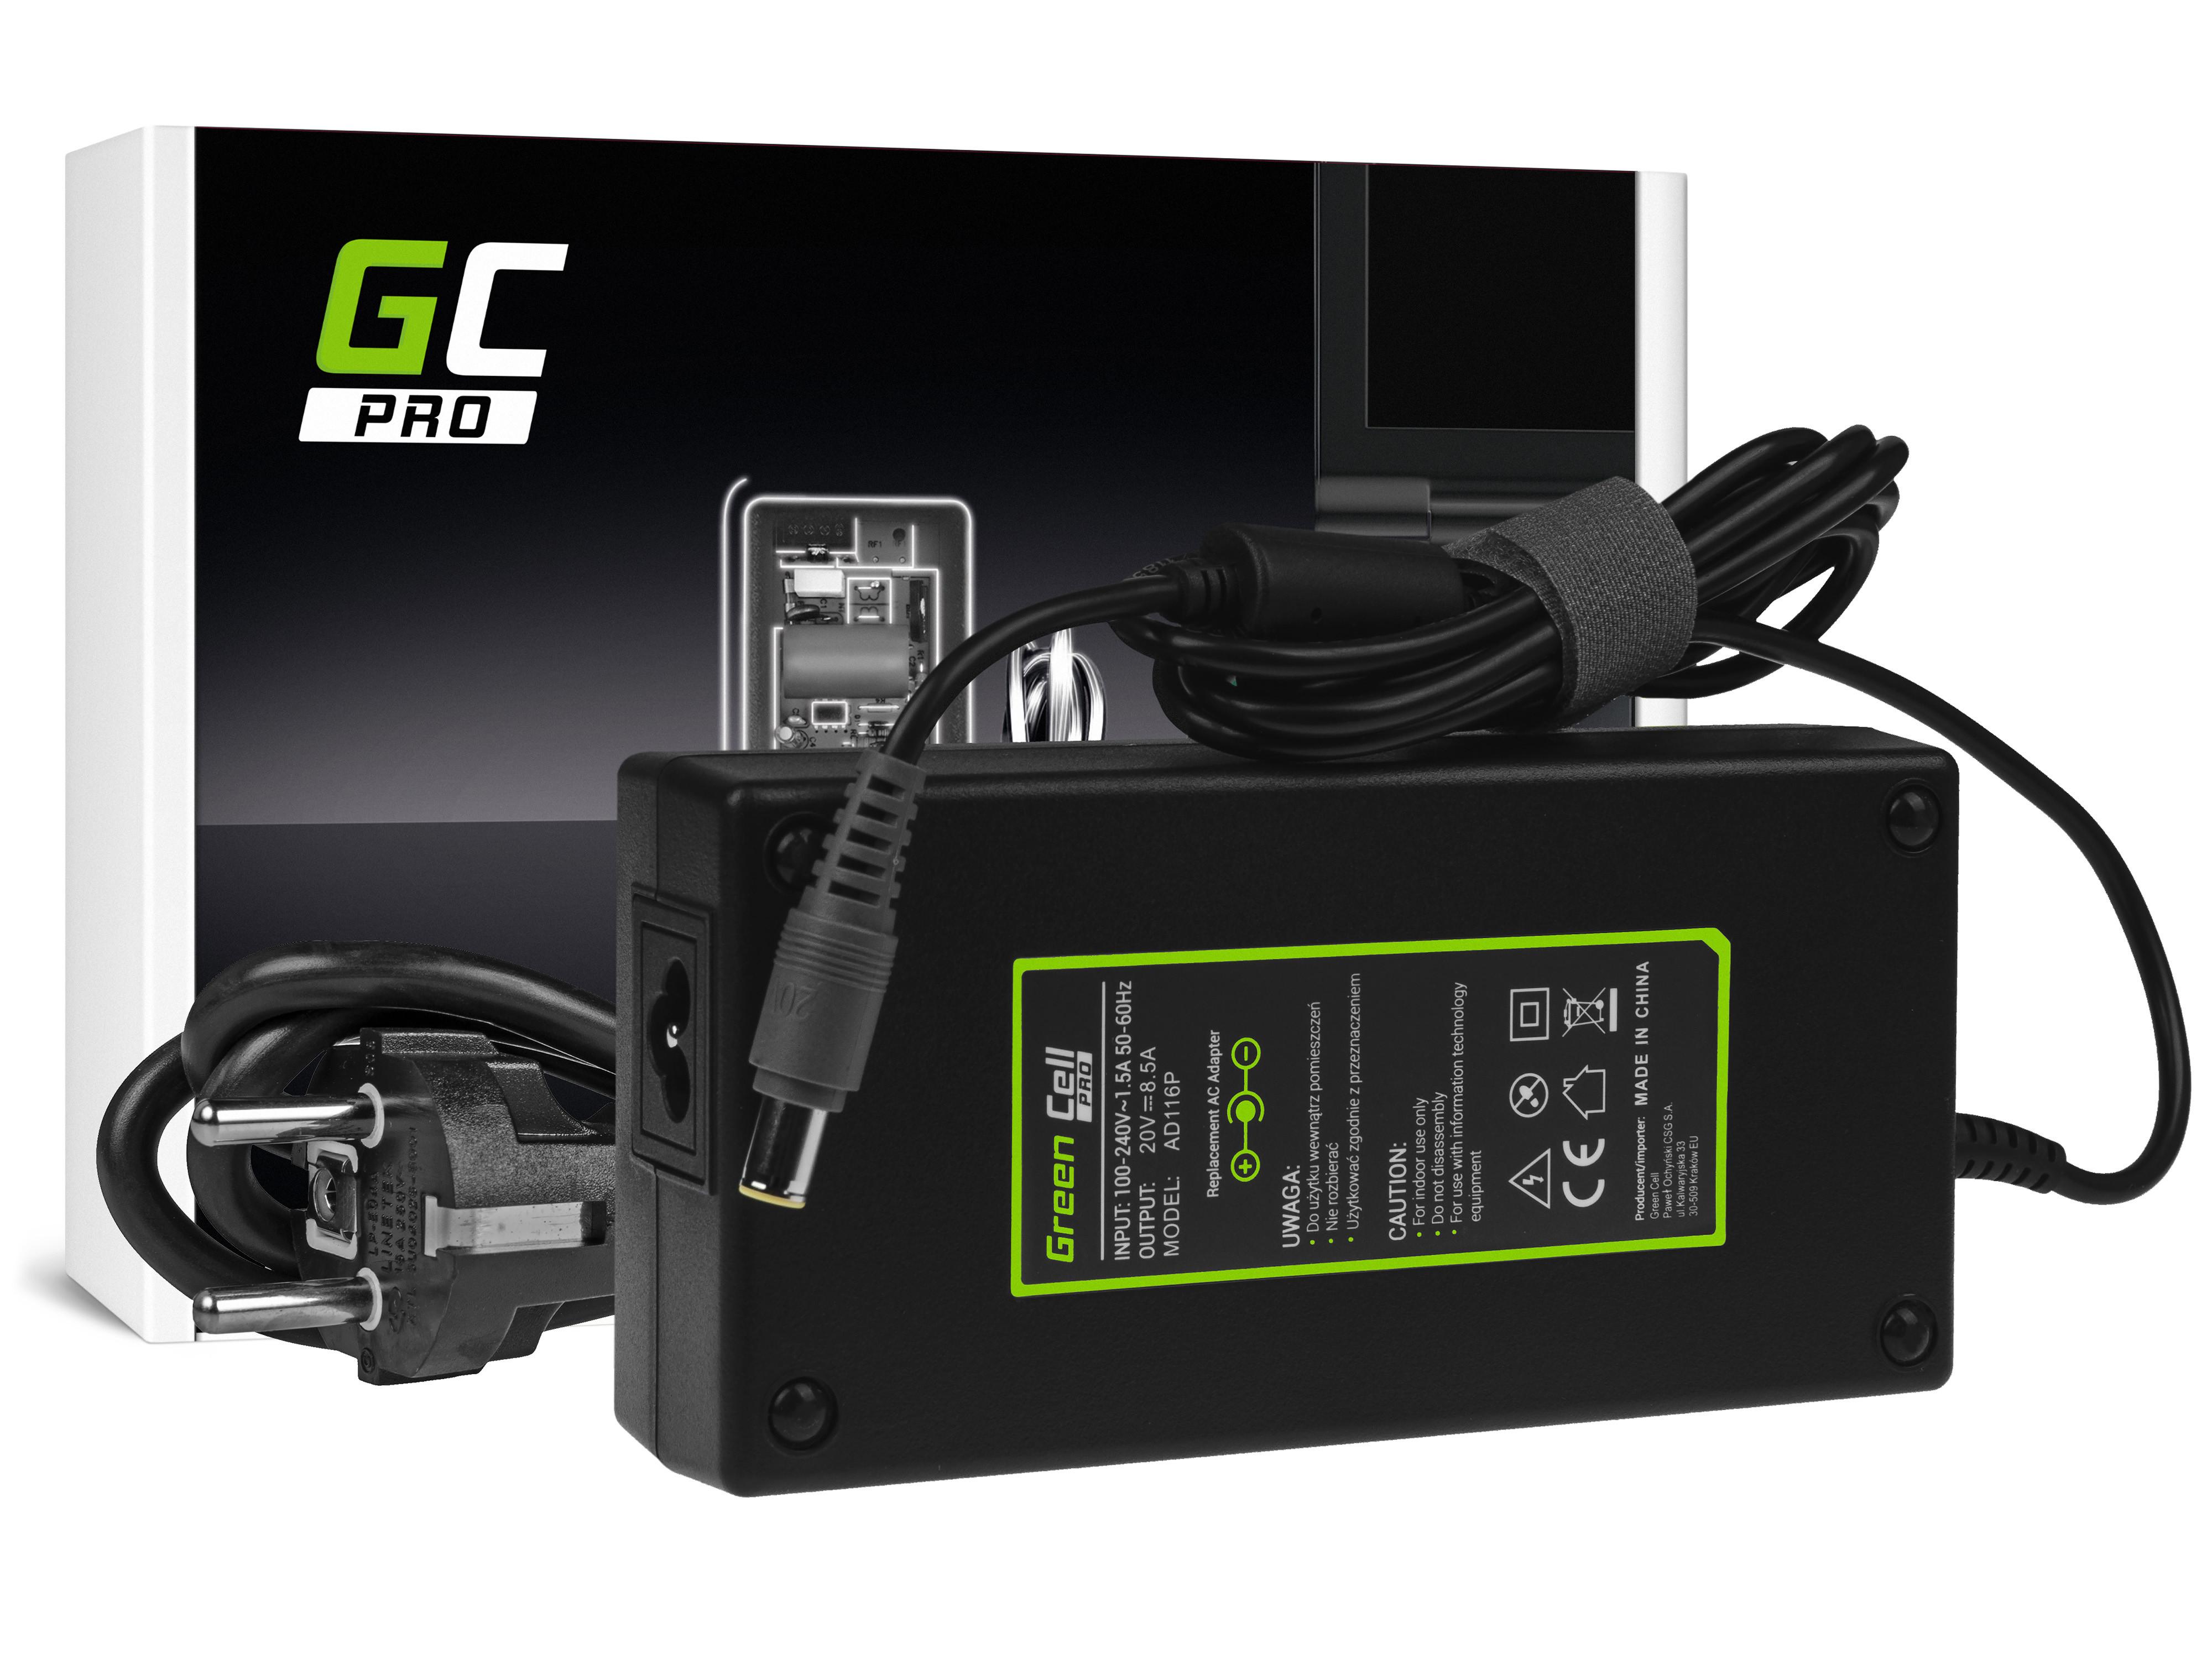 Green Cell AD116P Adaptér Nabíječka Lenovo ThinkPad T420 T430 T520 T530 W520 W530 20V 8.5A 170W